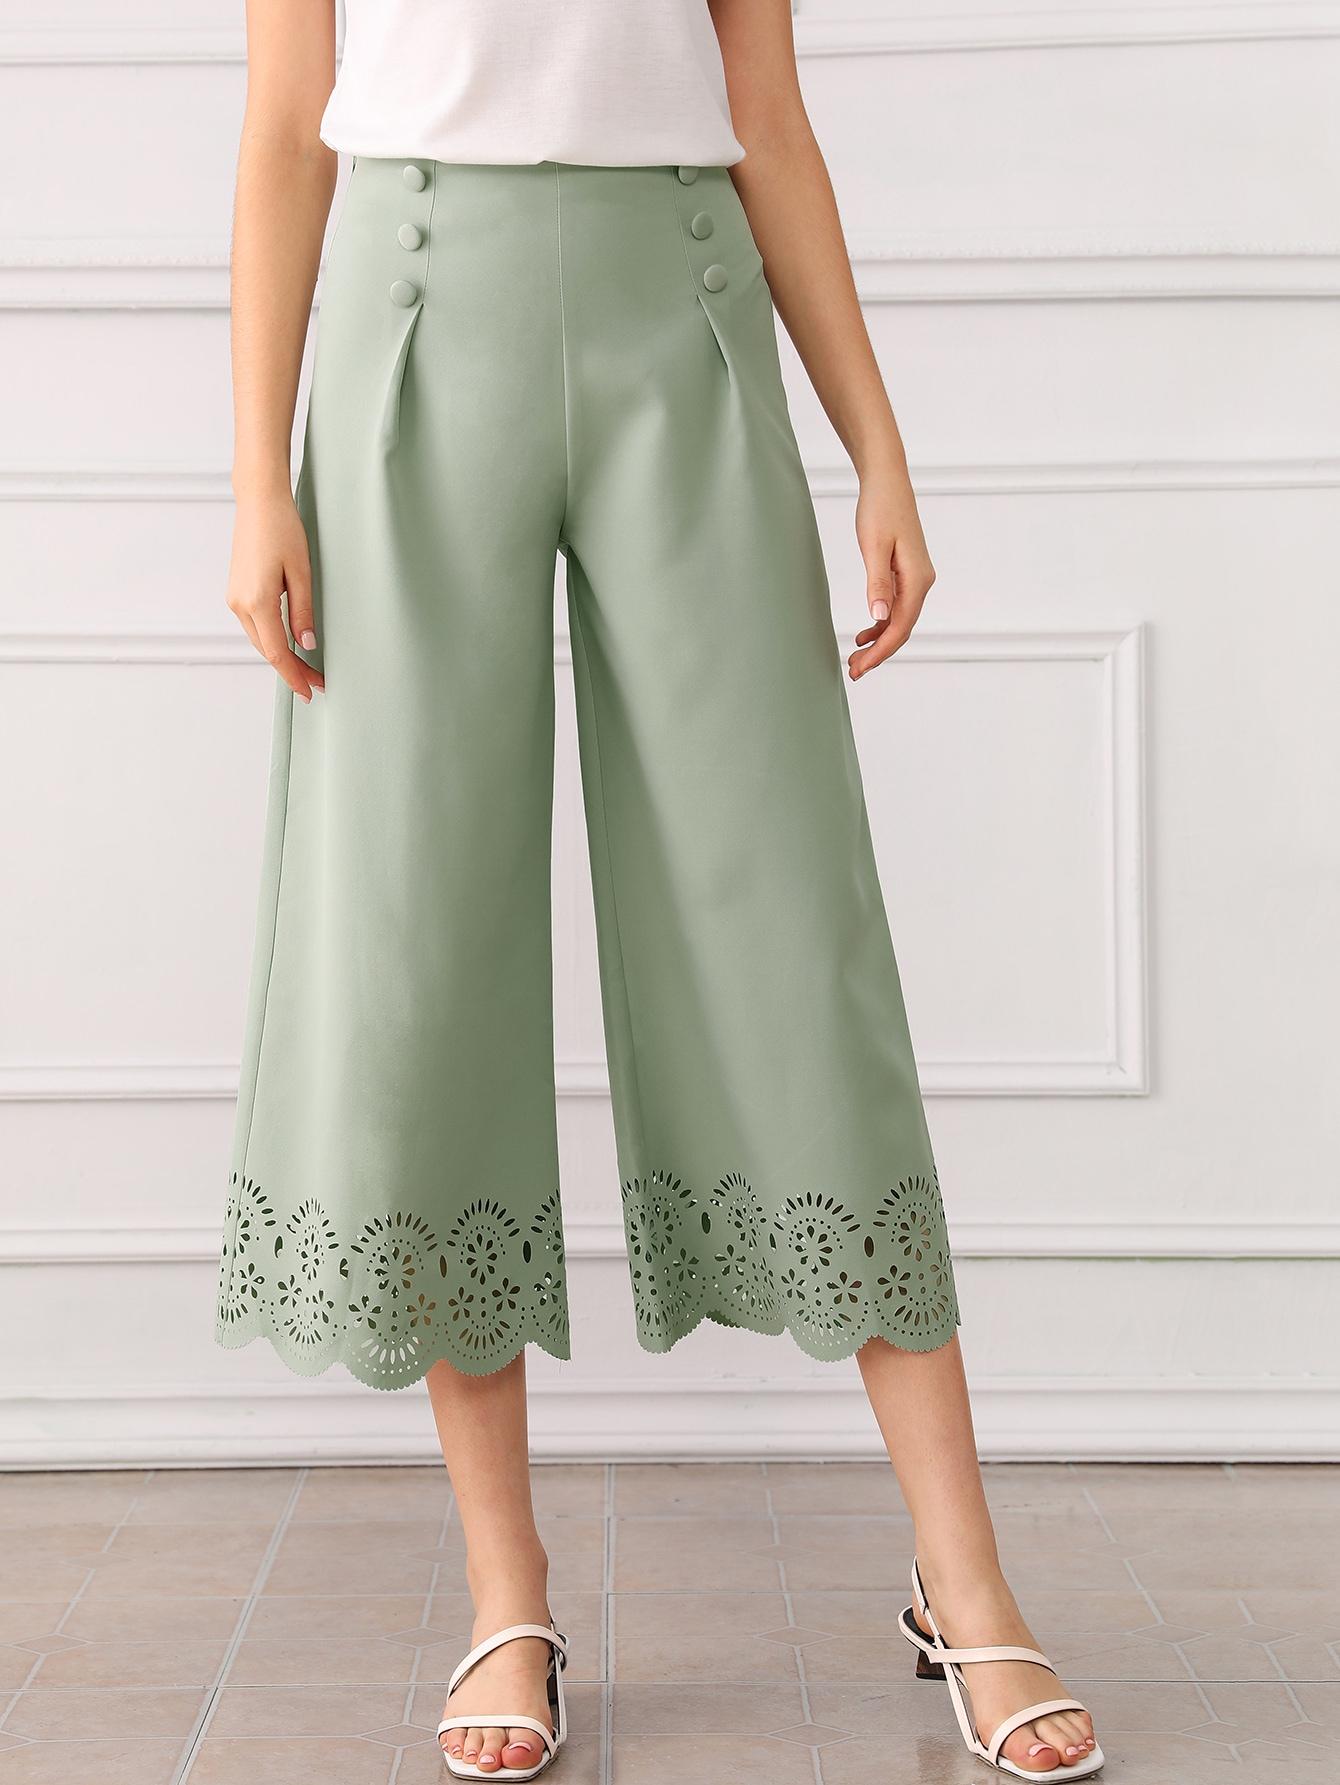 Фото - Широкие брюки с кружевом и пуговицами от SheIn зеленого цвета